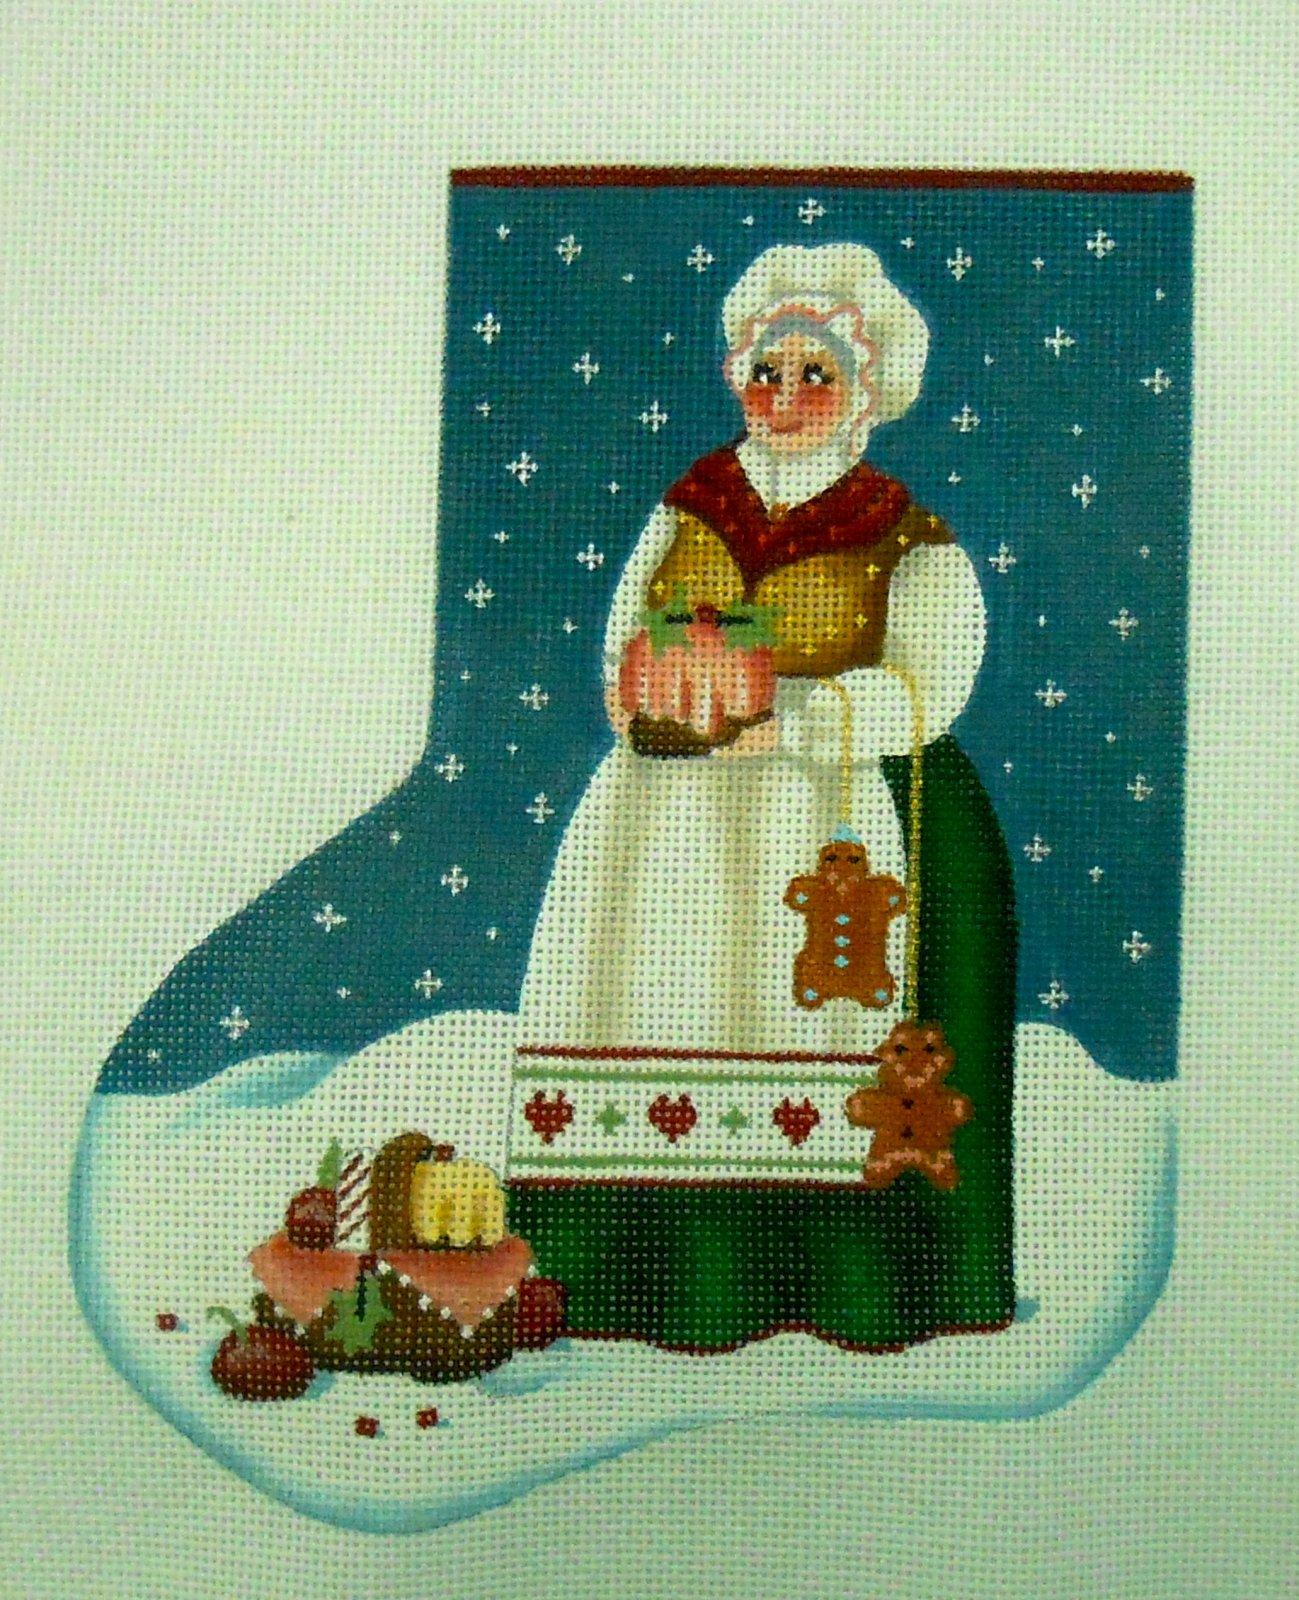 Mrs. Claus minisock